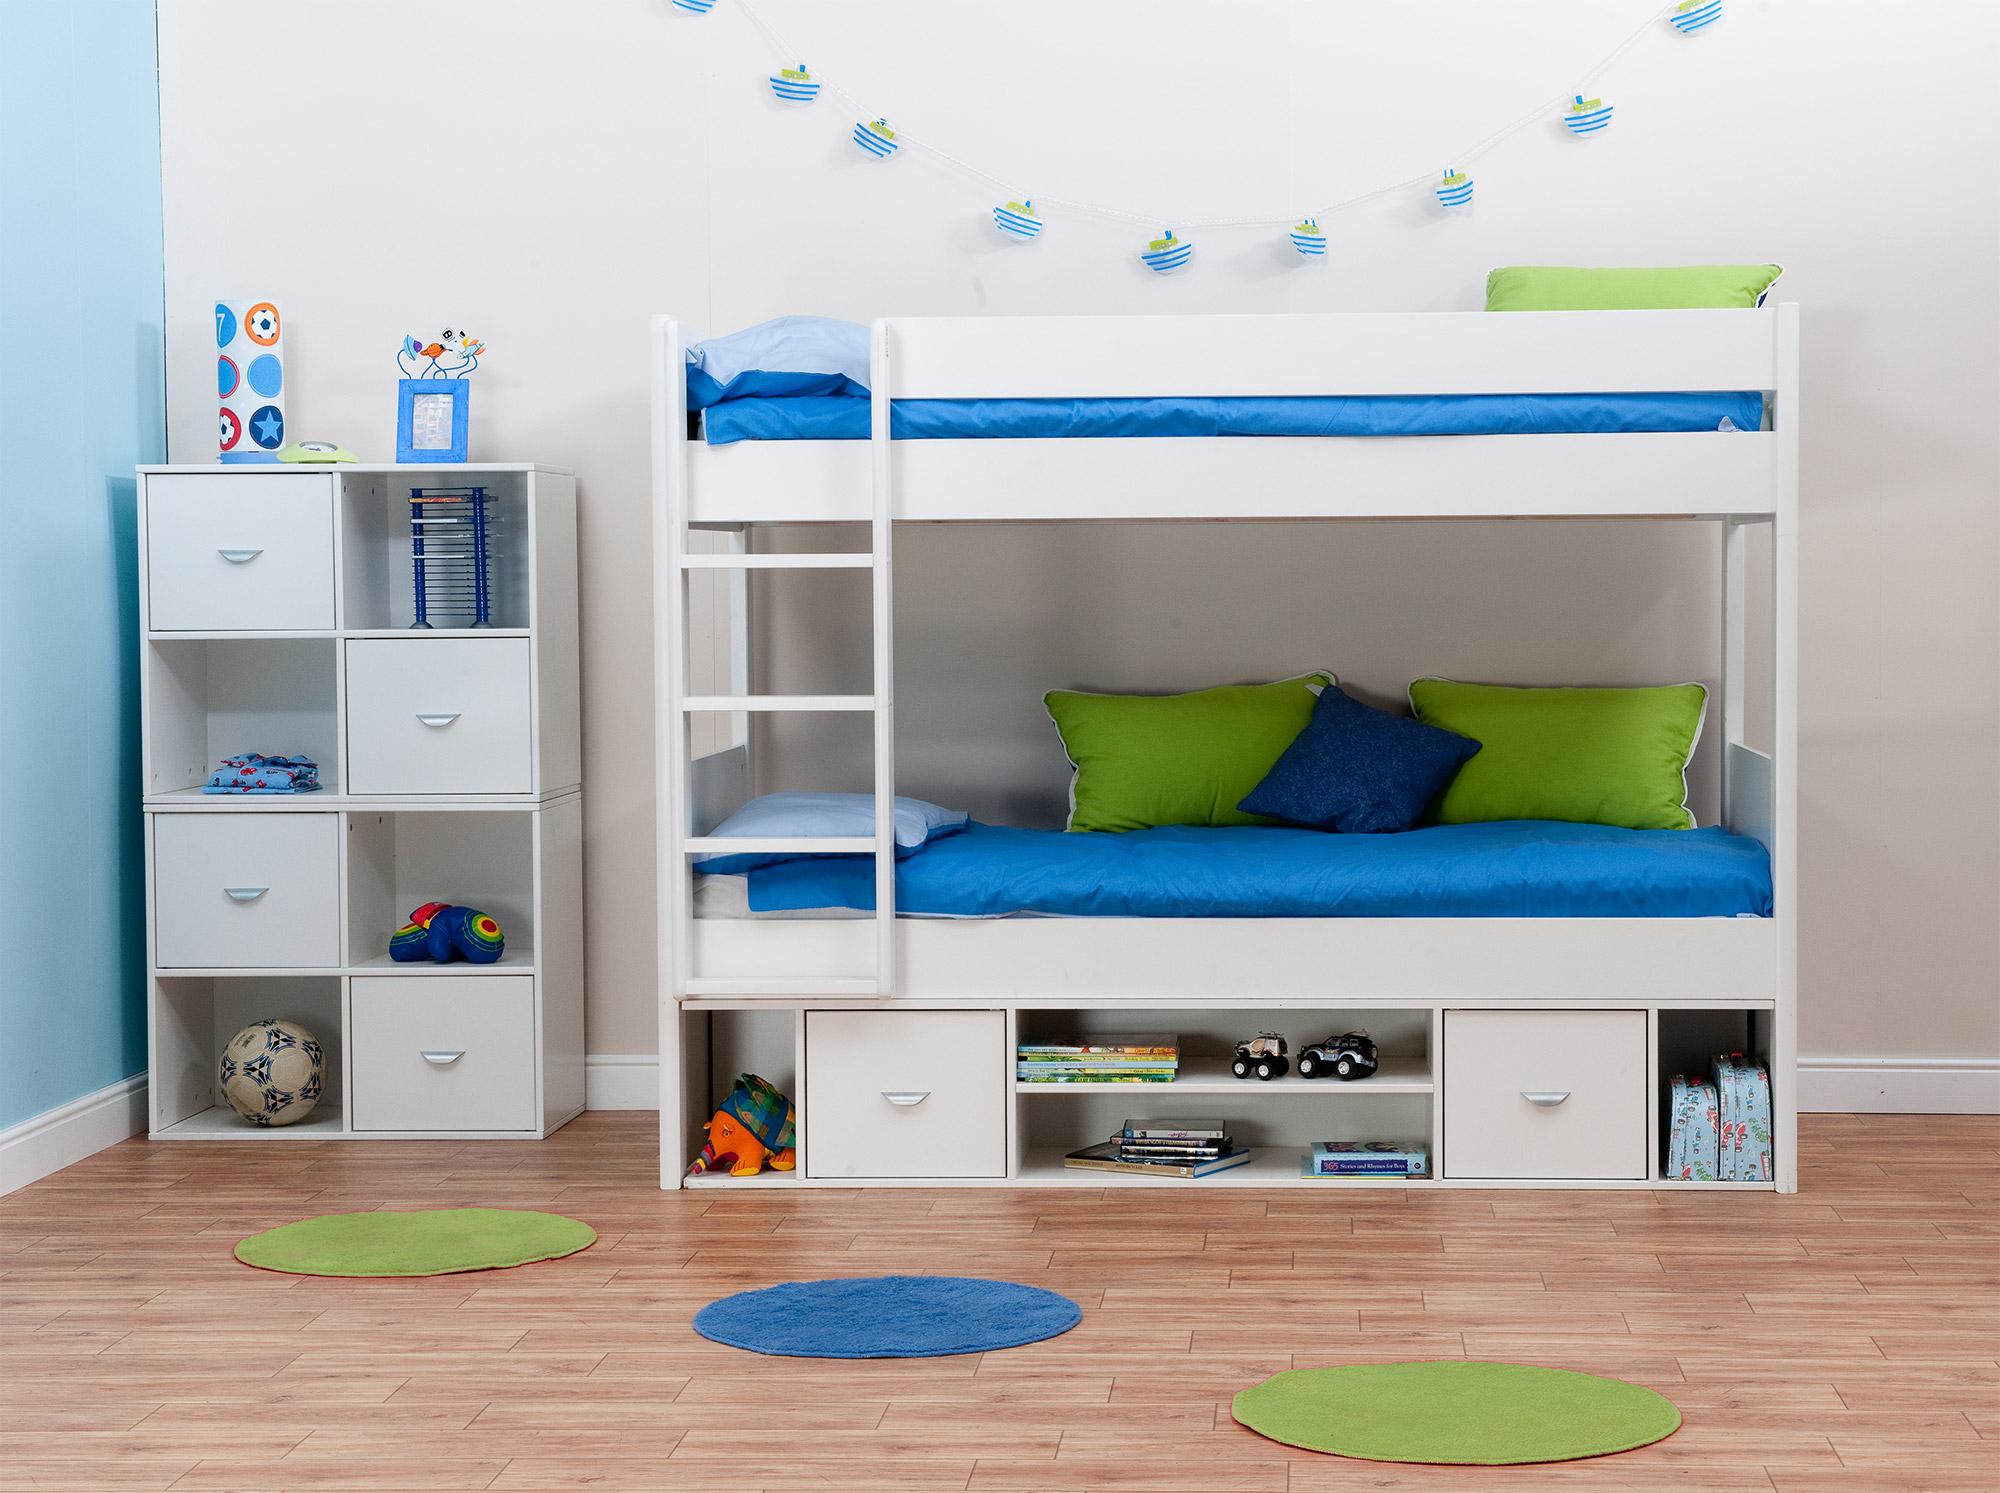 10 Inspiring Twins Bedroom Design Ideas For Your Twins Boy Talkdecor